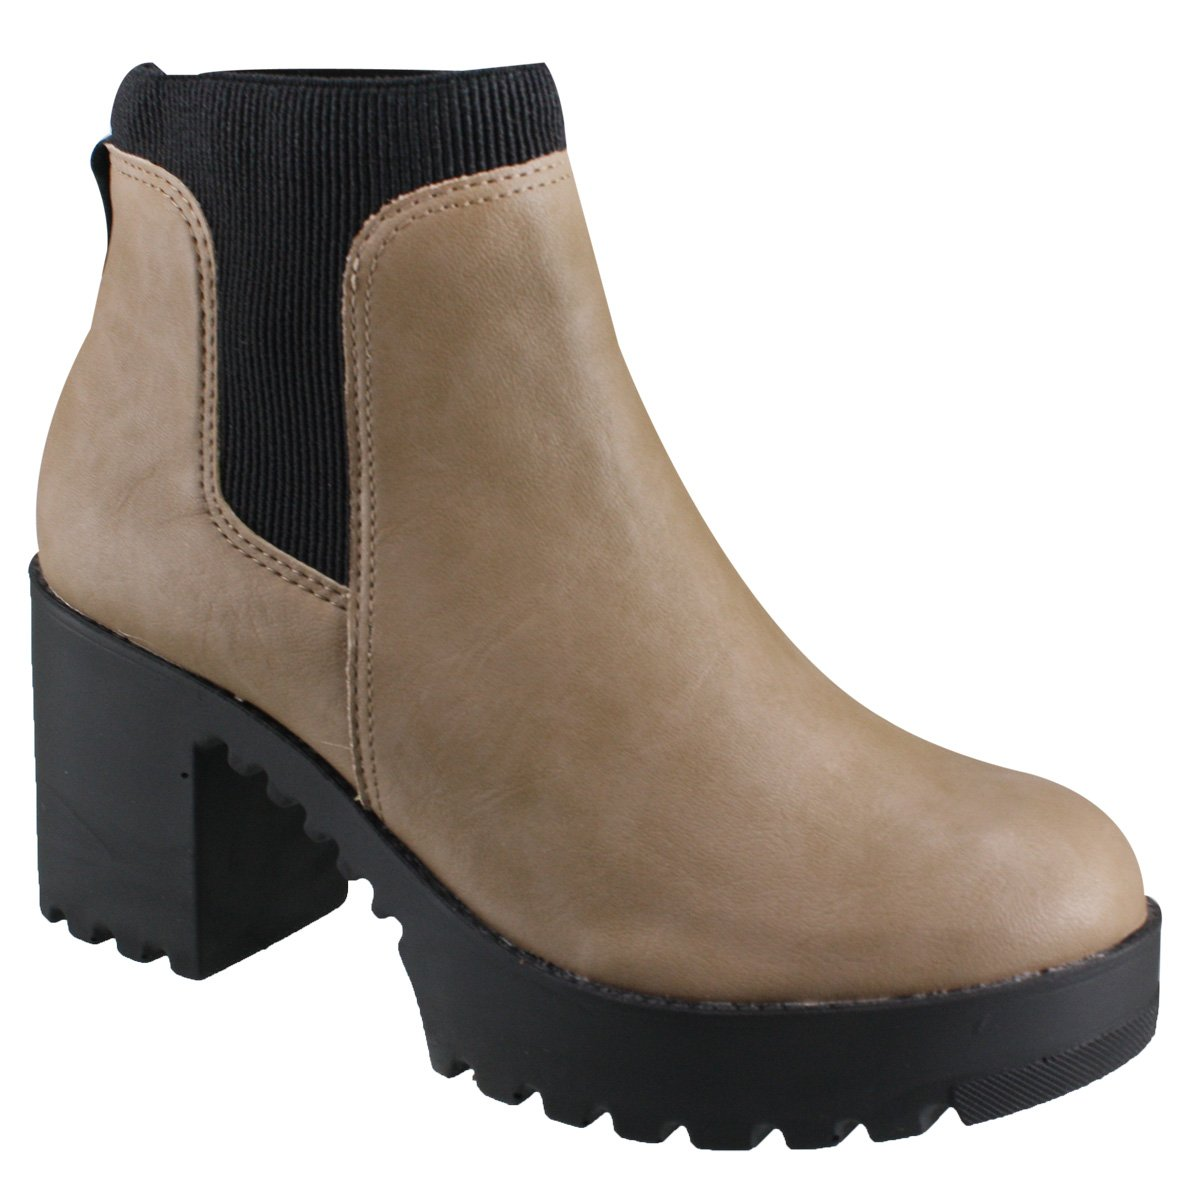 8d51380e98 Bota Cravo e Canela Ankle Boot 150007-2 - Fendi Preto (Nappa Rustic ...